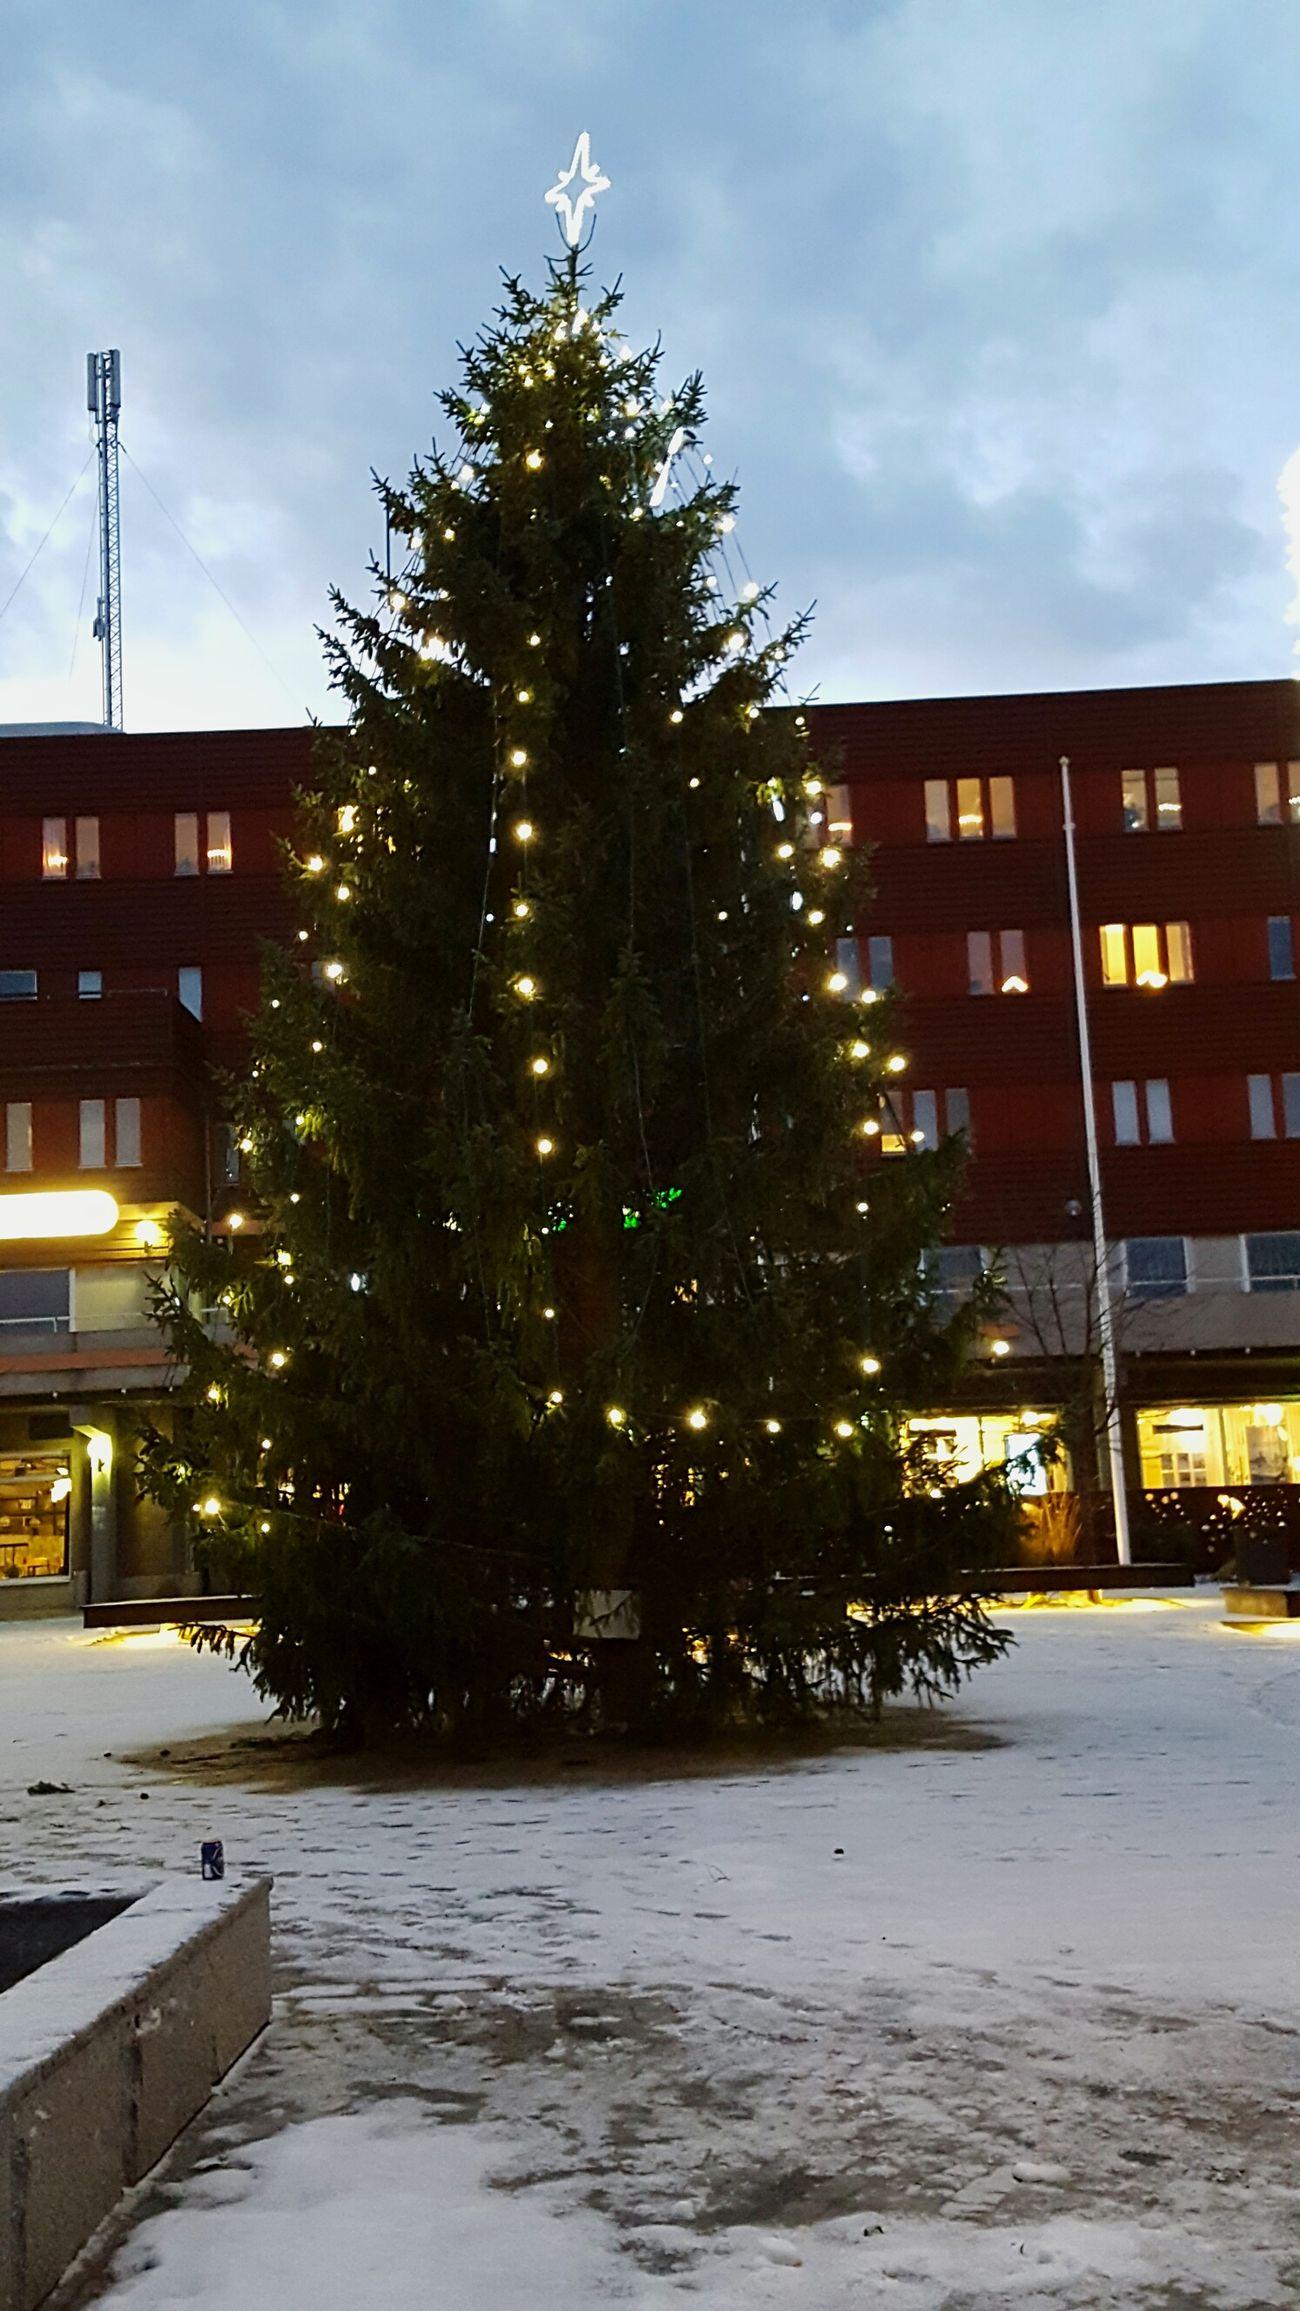 Tree Outdoors Christmas Christmas Tree Christmas Lights Sweden Firtree Lights Tradition Sky Greenwinter